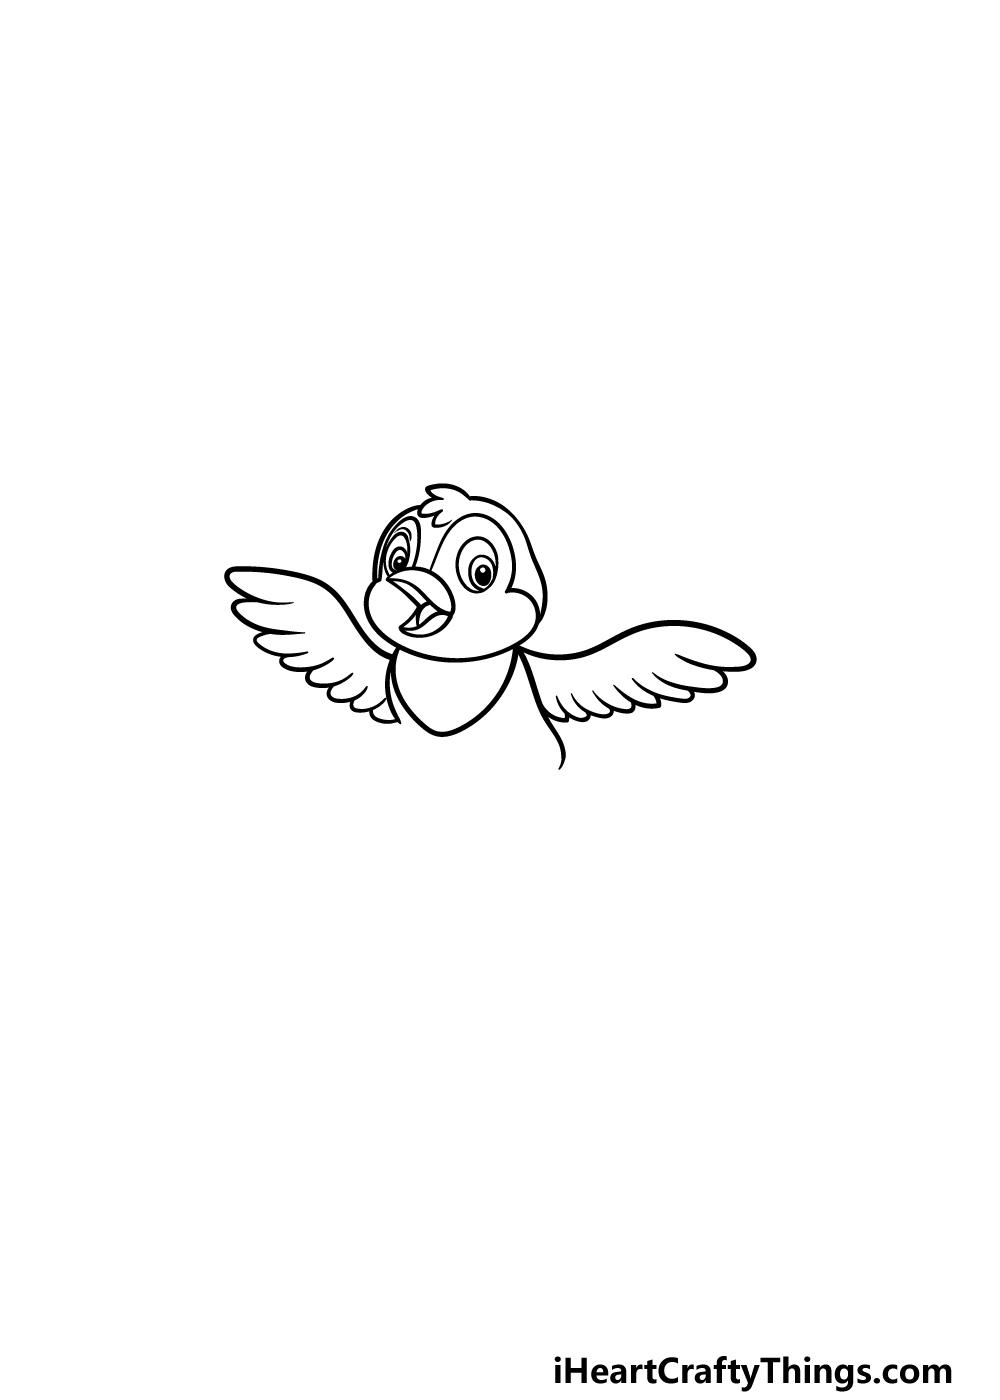 how to draw a cartoon bird step 2